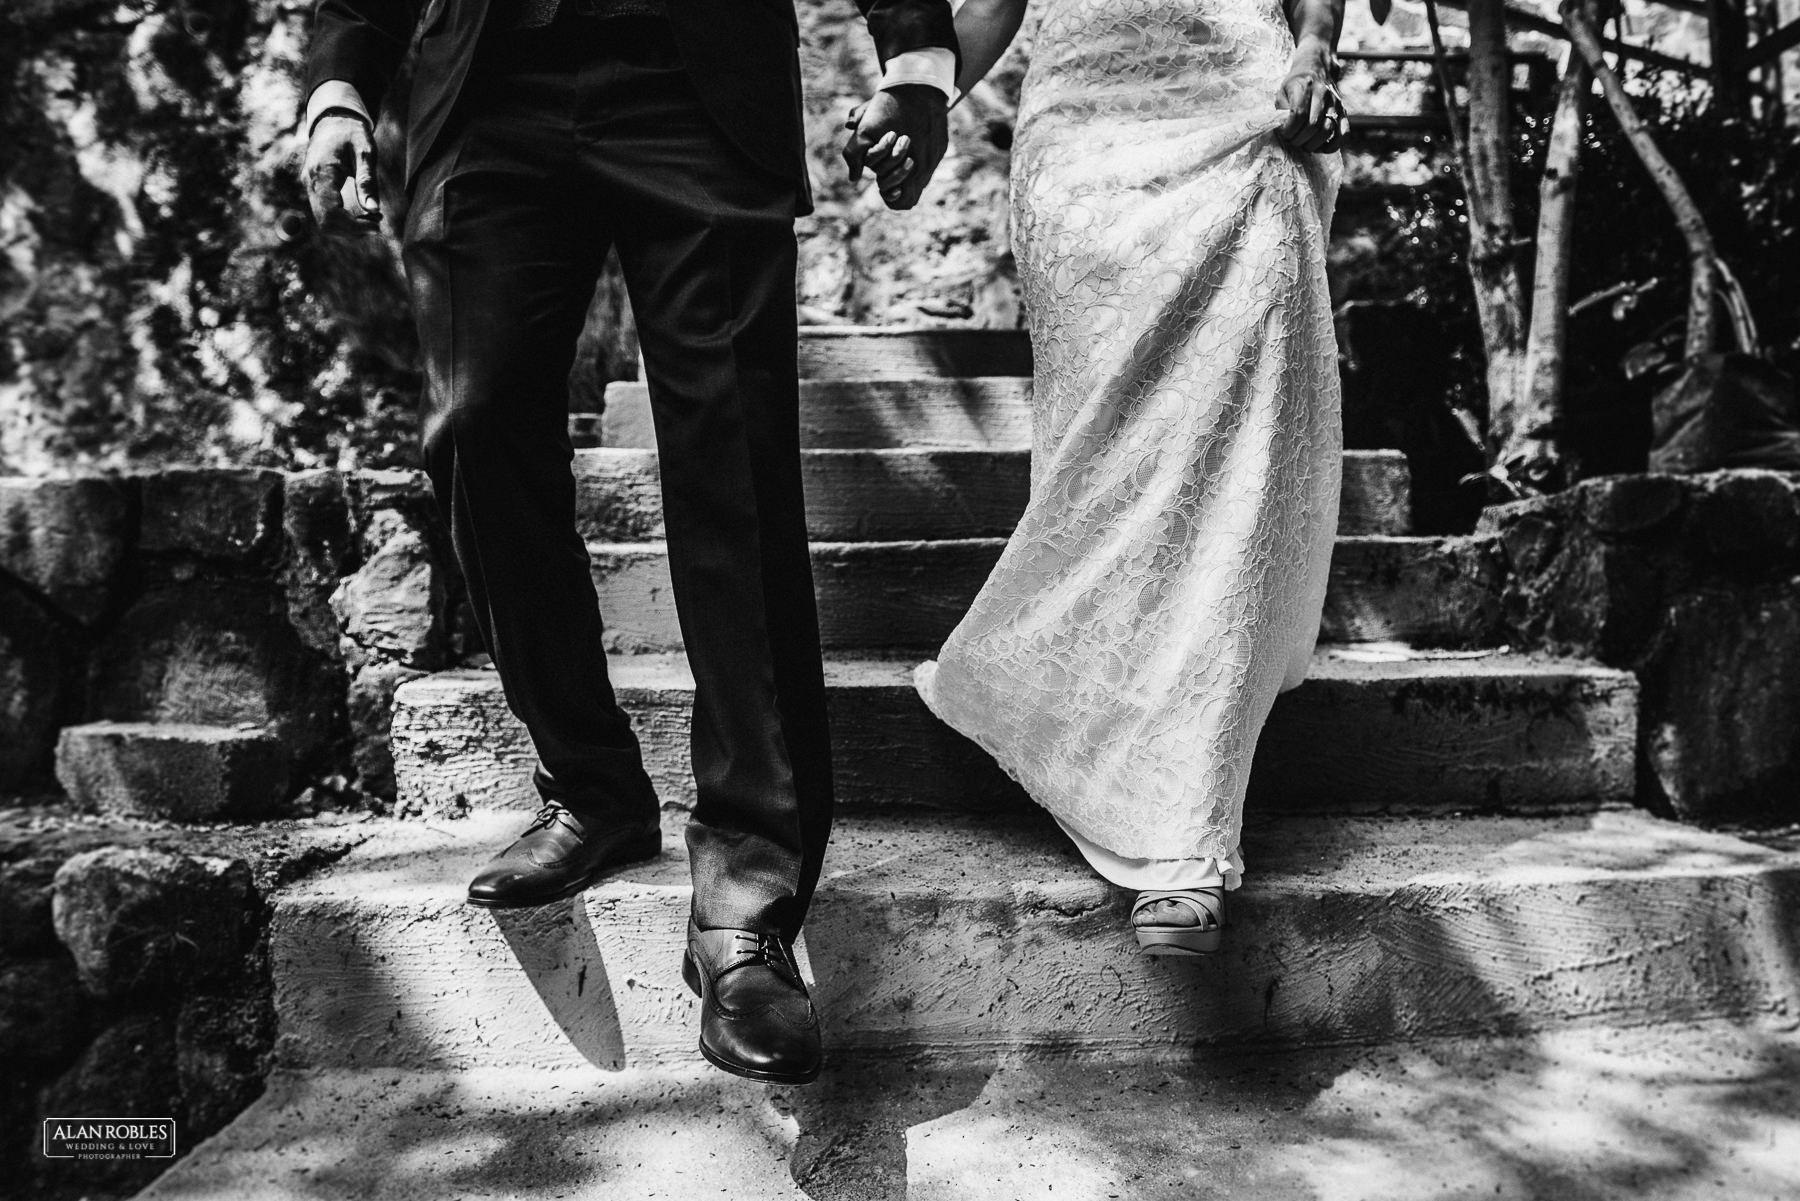 Fotografo de bodas guadalajara Alan Robles - Pinare terraza bistro 10